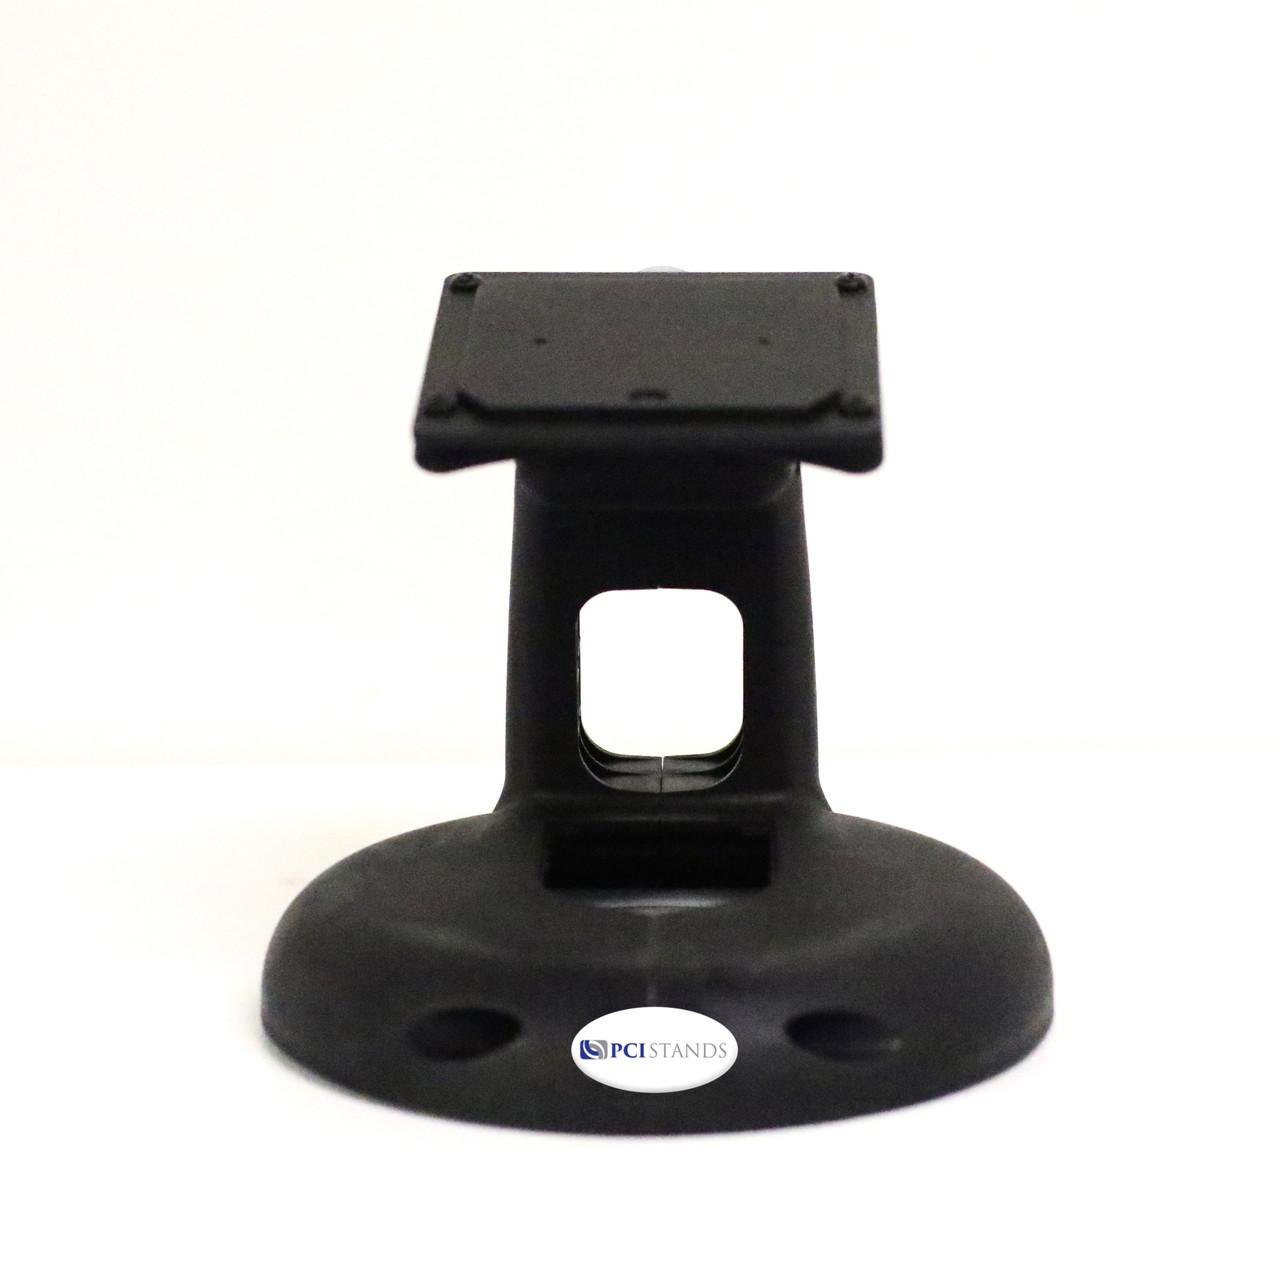 Verifone Vx820 Key Locking Tilt /& Swivel Stand Black Steel